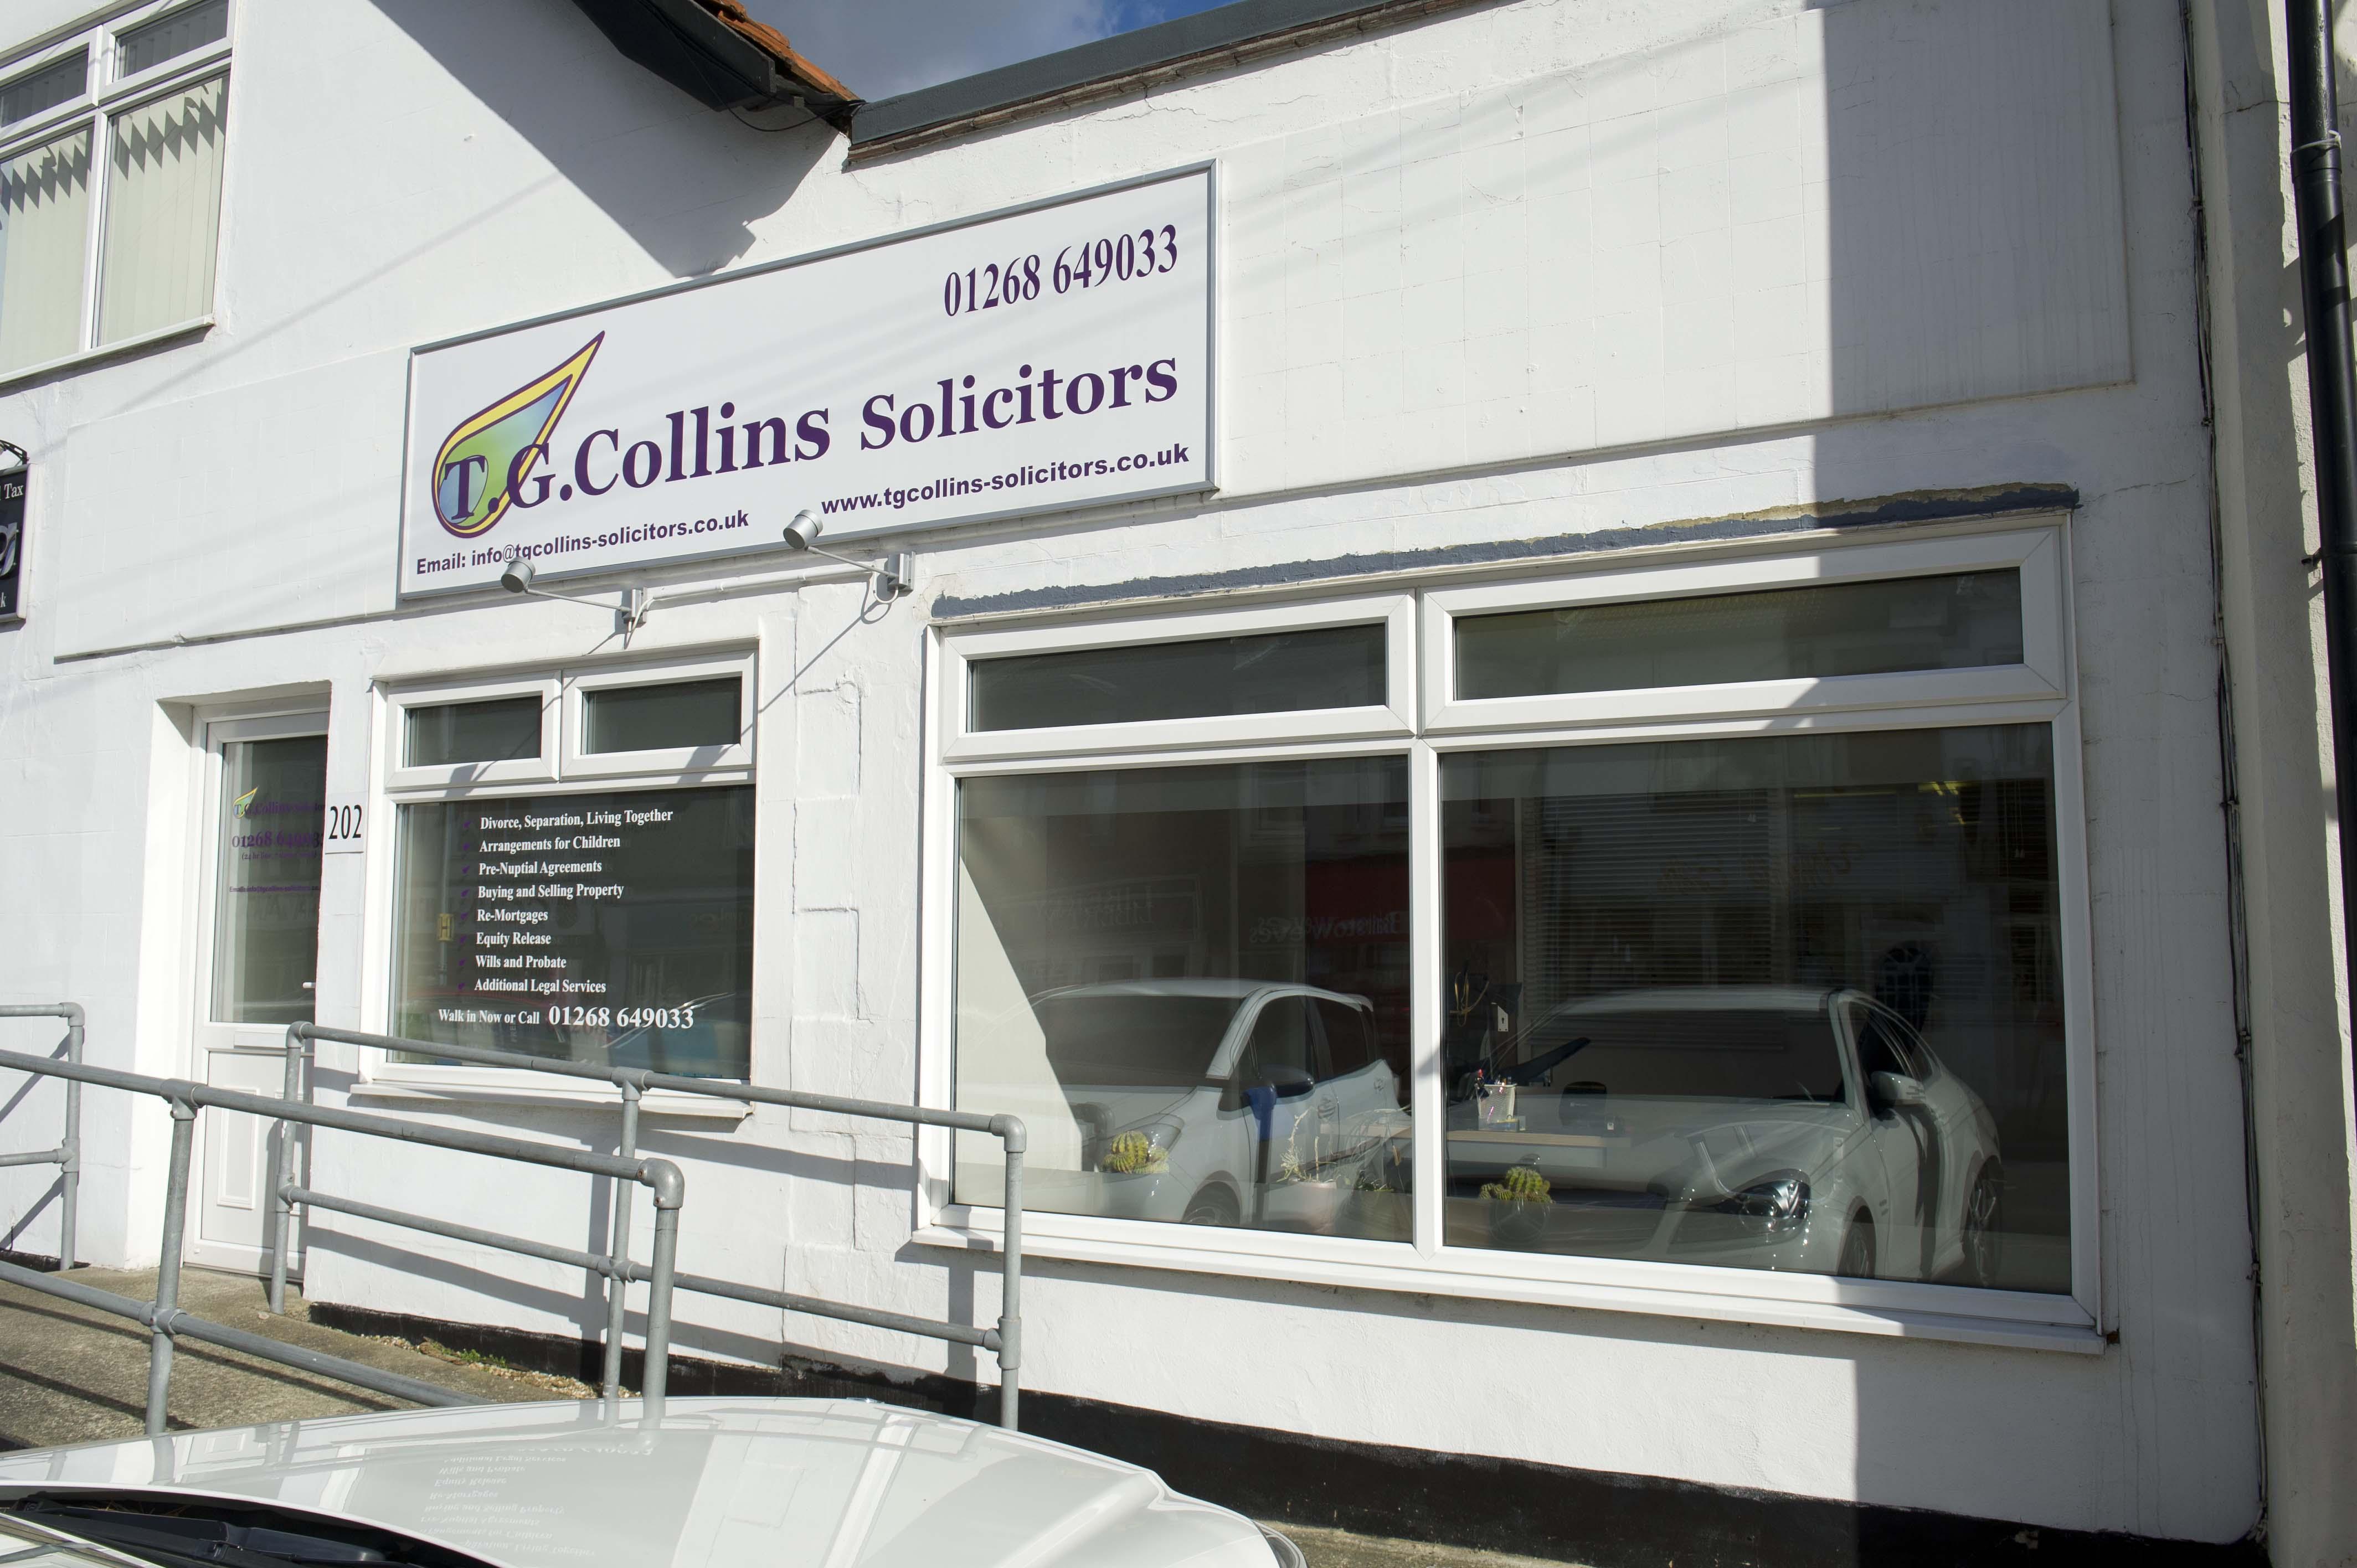 T.G.Collins Solicitors